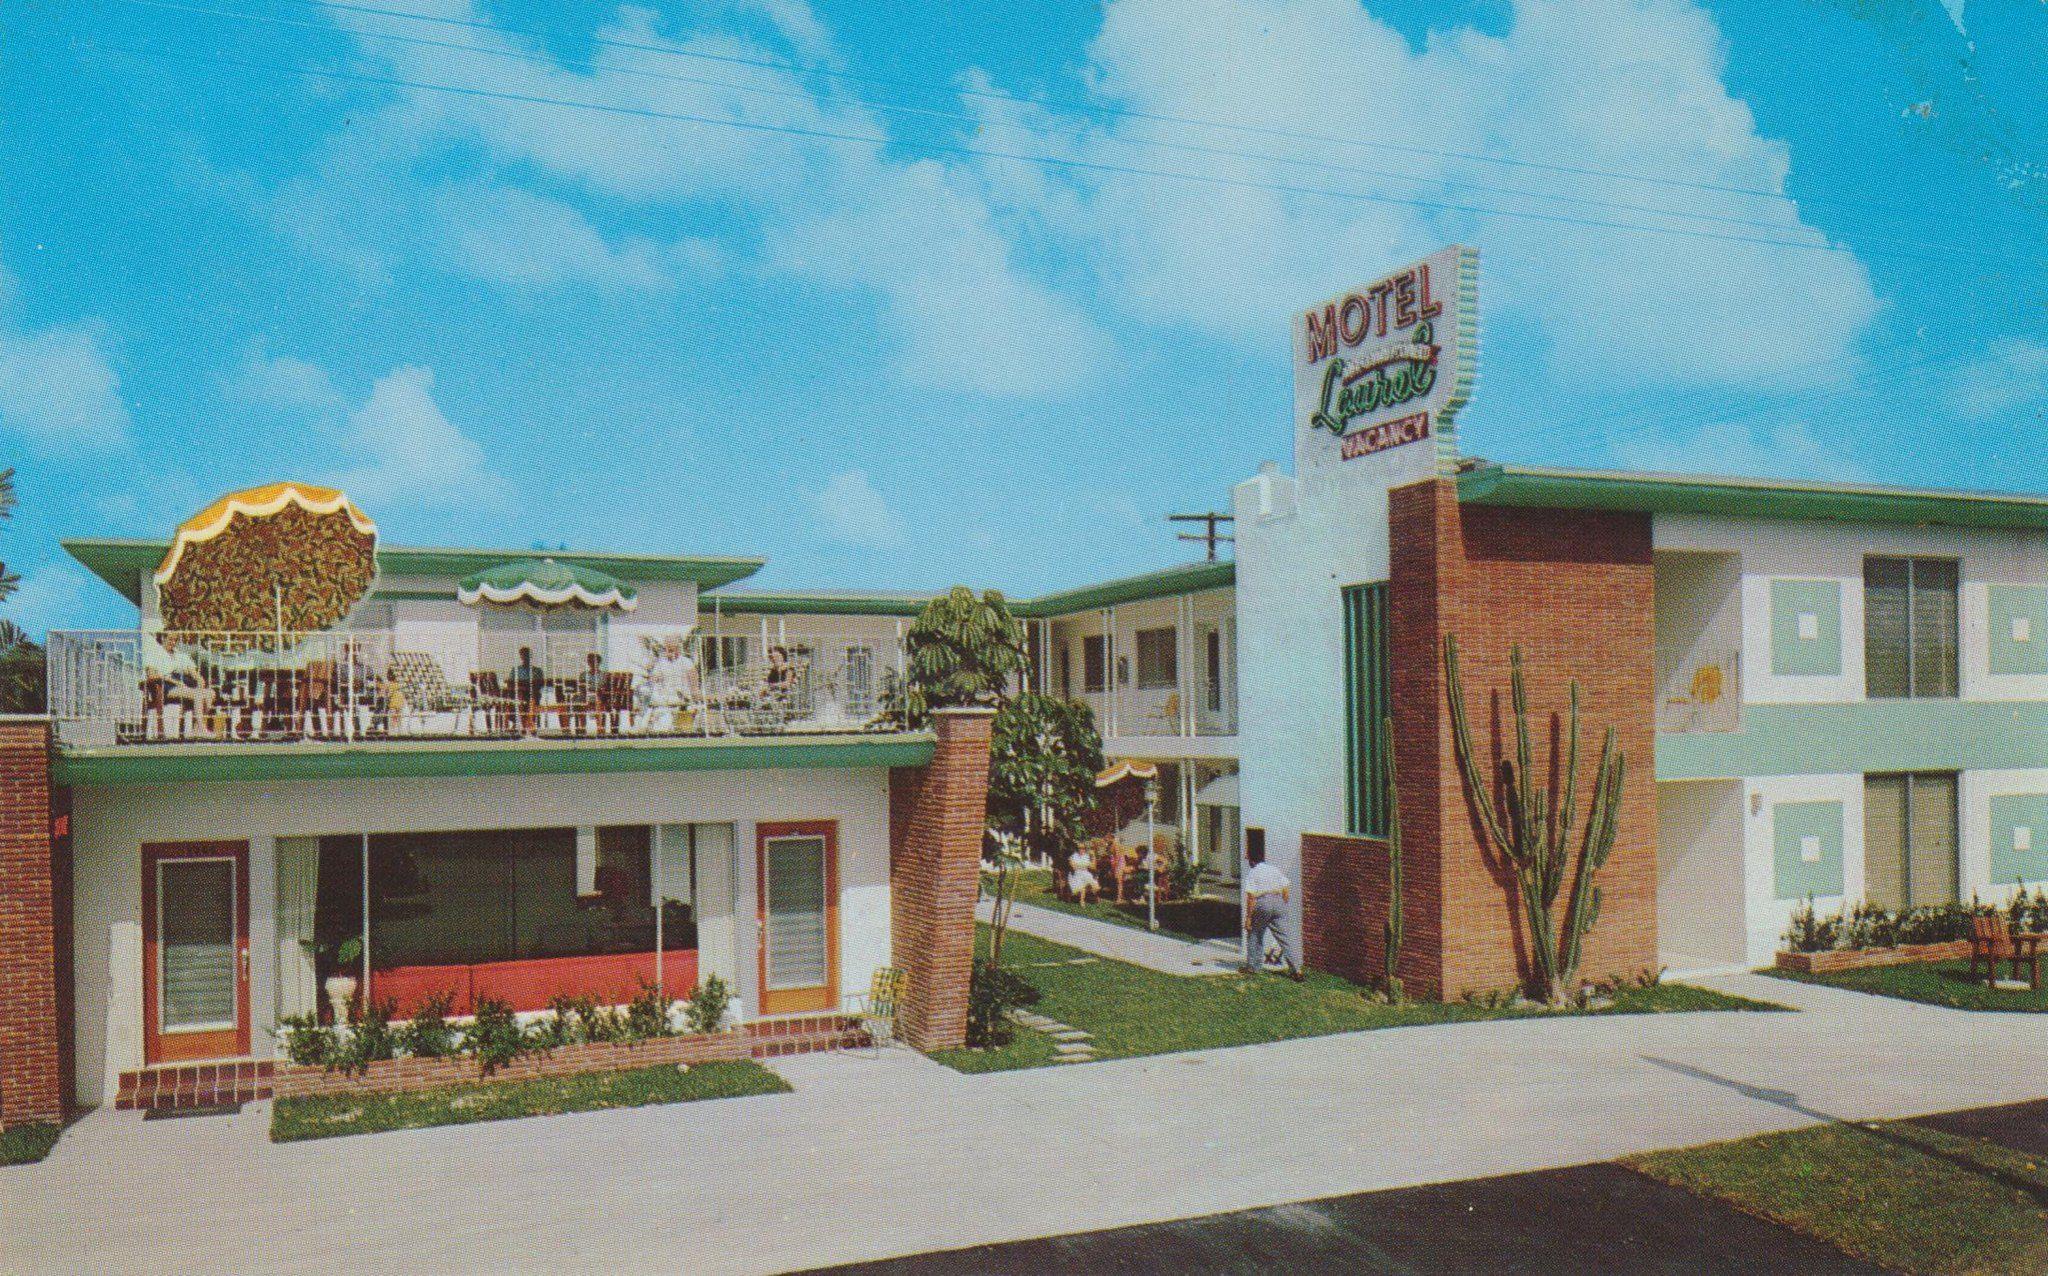 Motel Laurel Miami Florida In 2020 Hotel Motel Vintage Hotels Motel